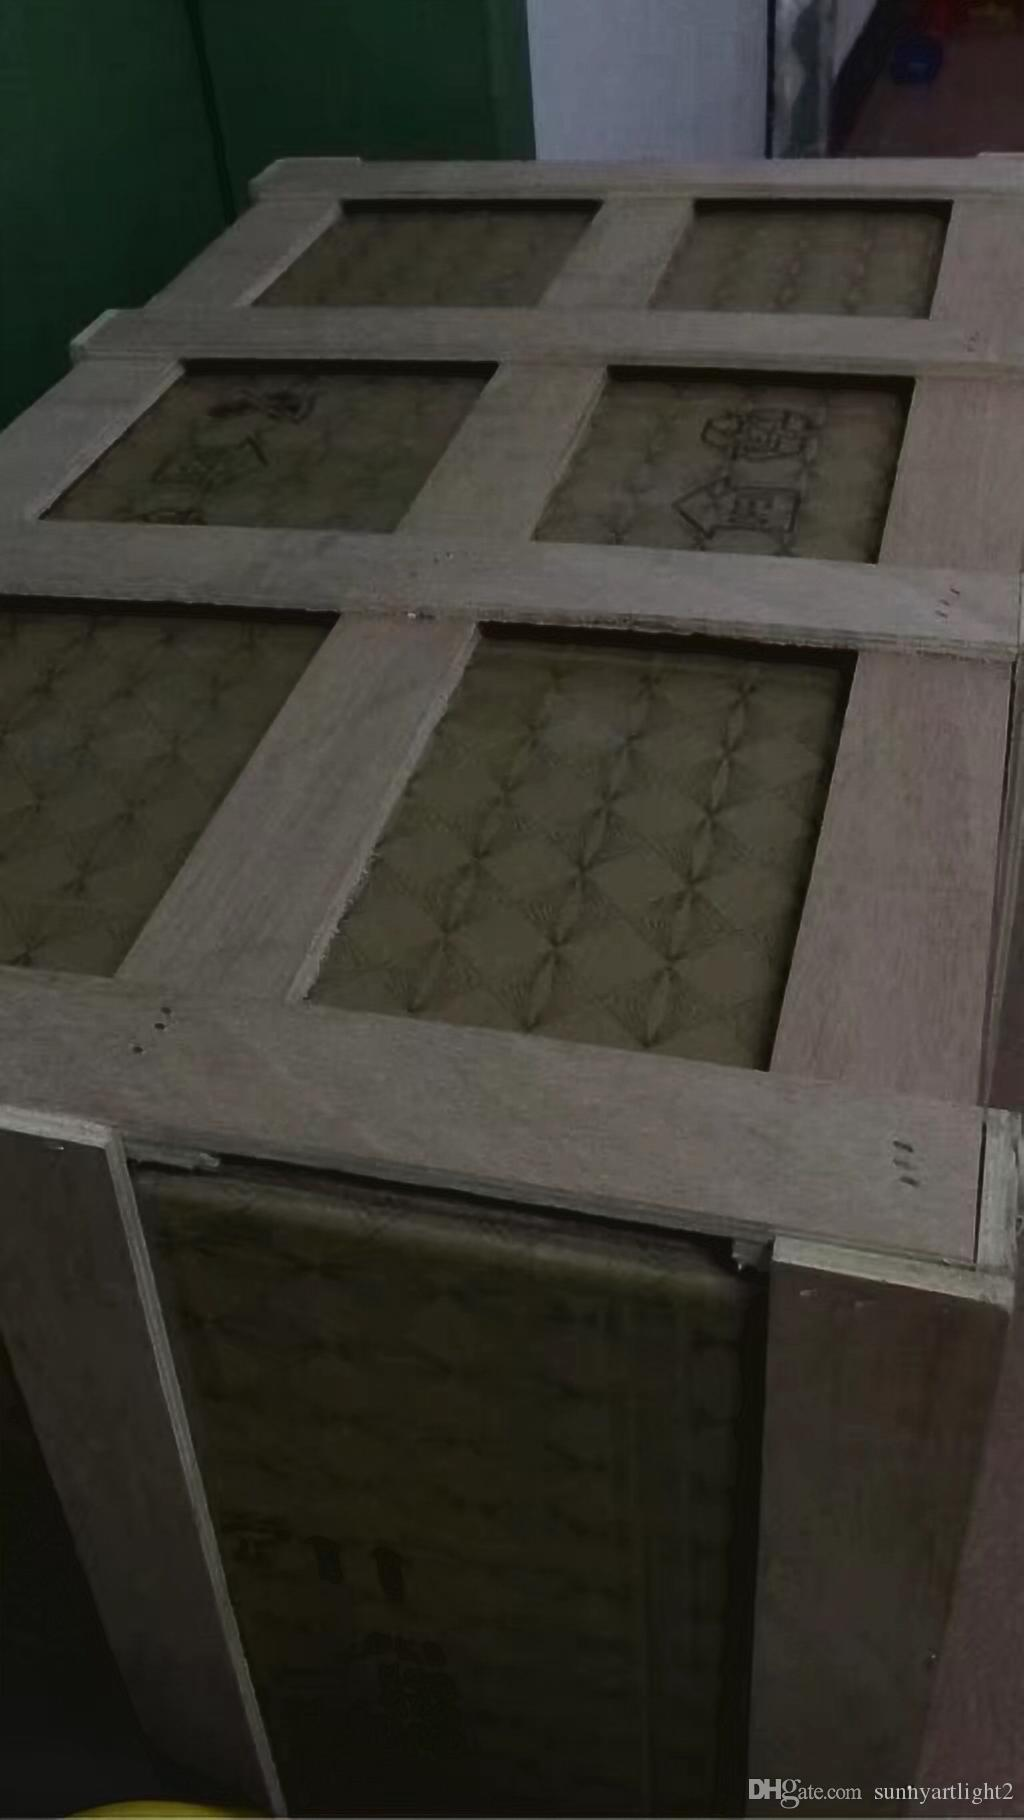 100% soprado Borosilicate Home Design de luxo Sala de cristal do teto luz Dale Chihully Murano Vidro Candelabro